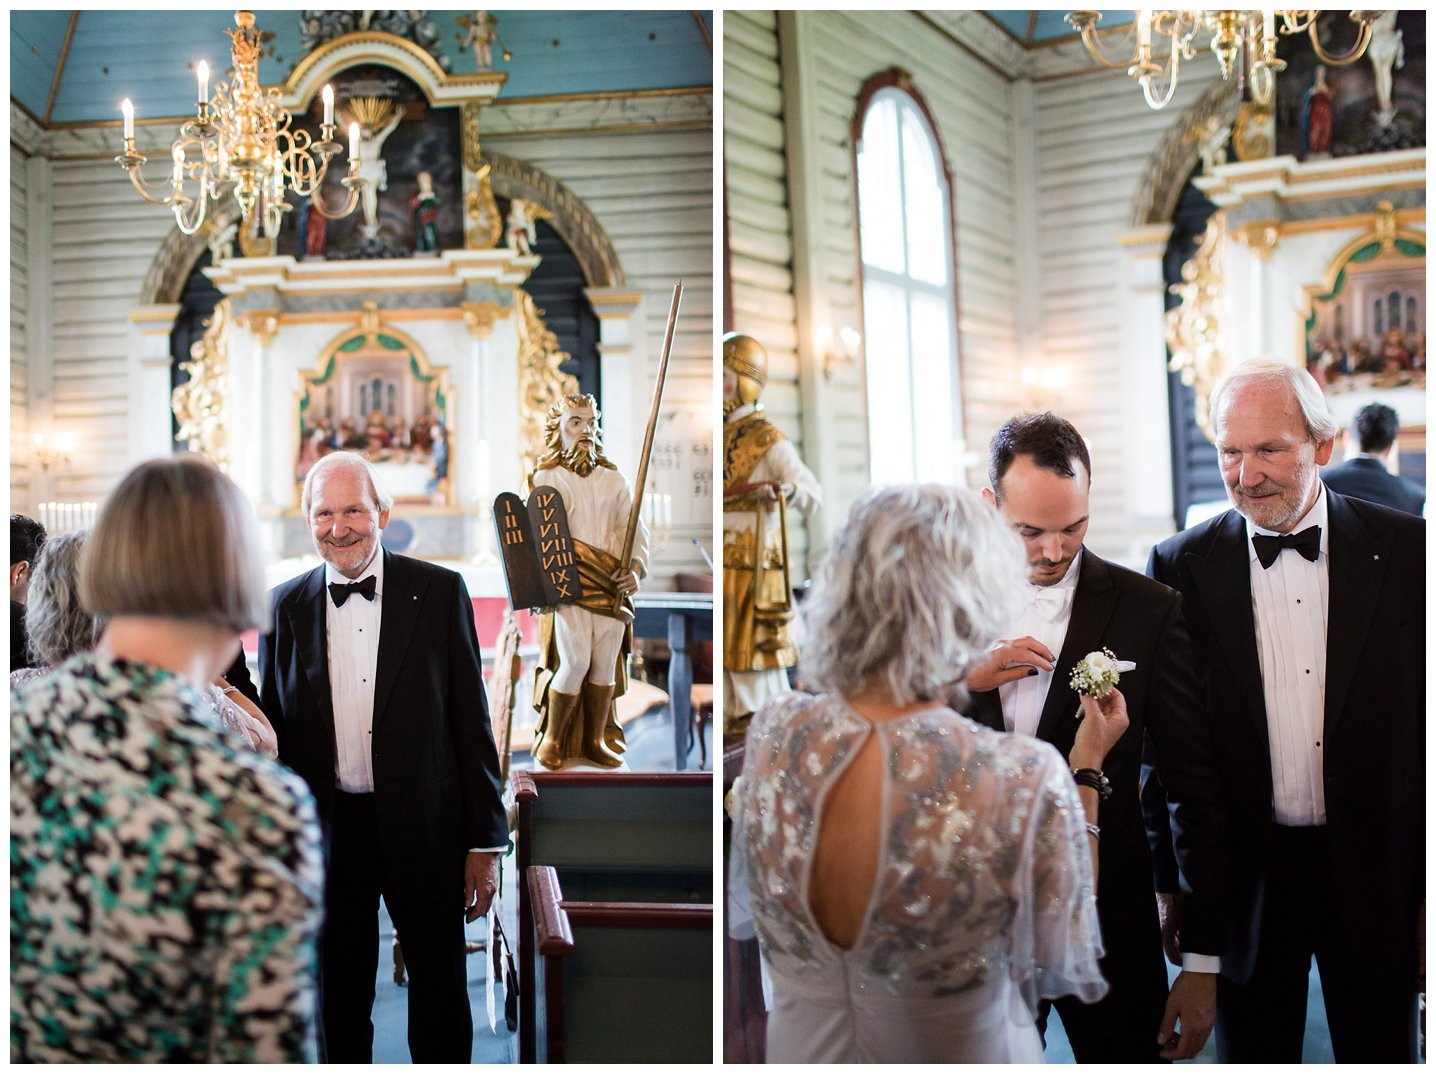 Fotograf-Eline-Jacobine-Bryllup-Villa-Malla-Camilla-og-Alexander_0044